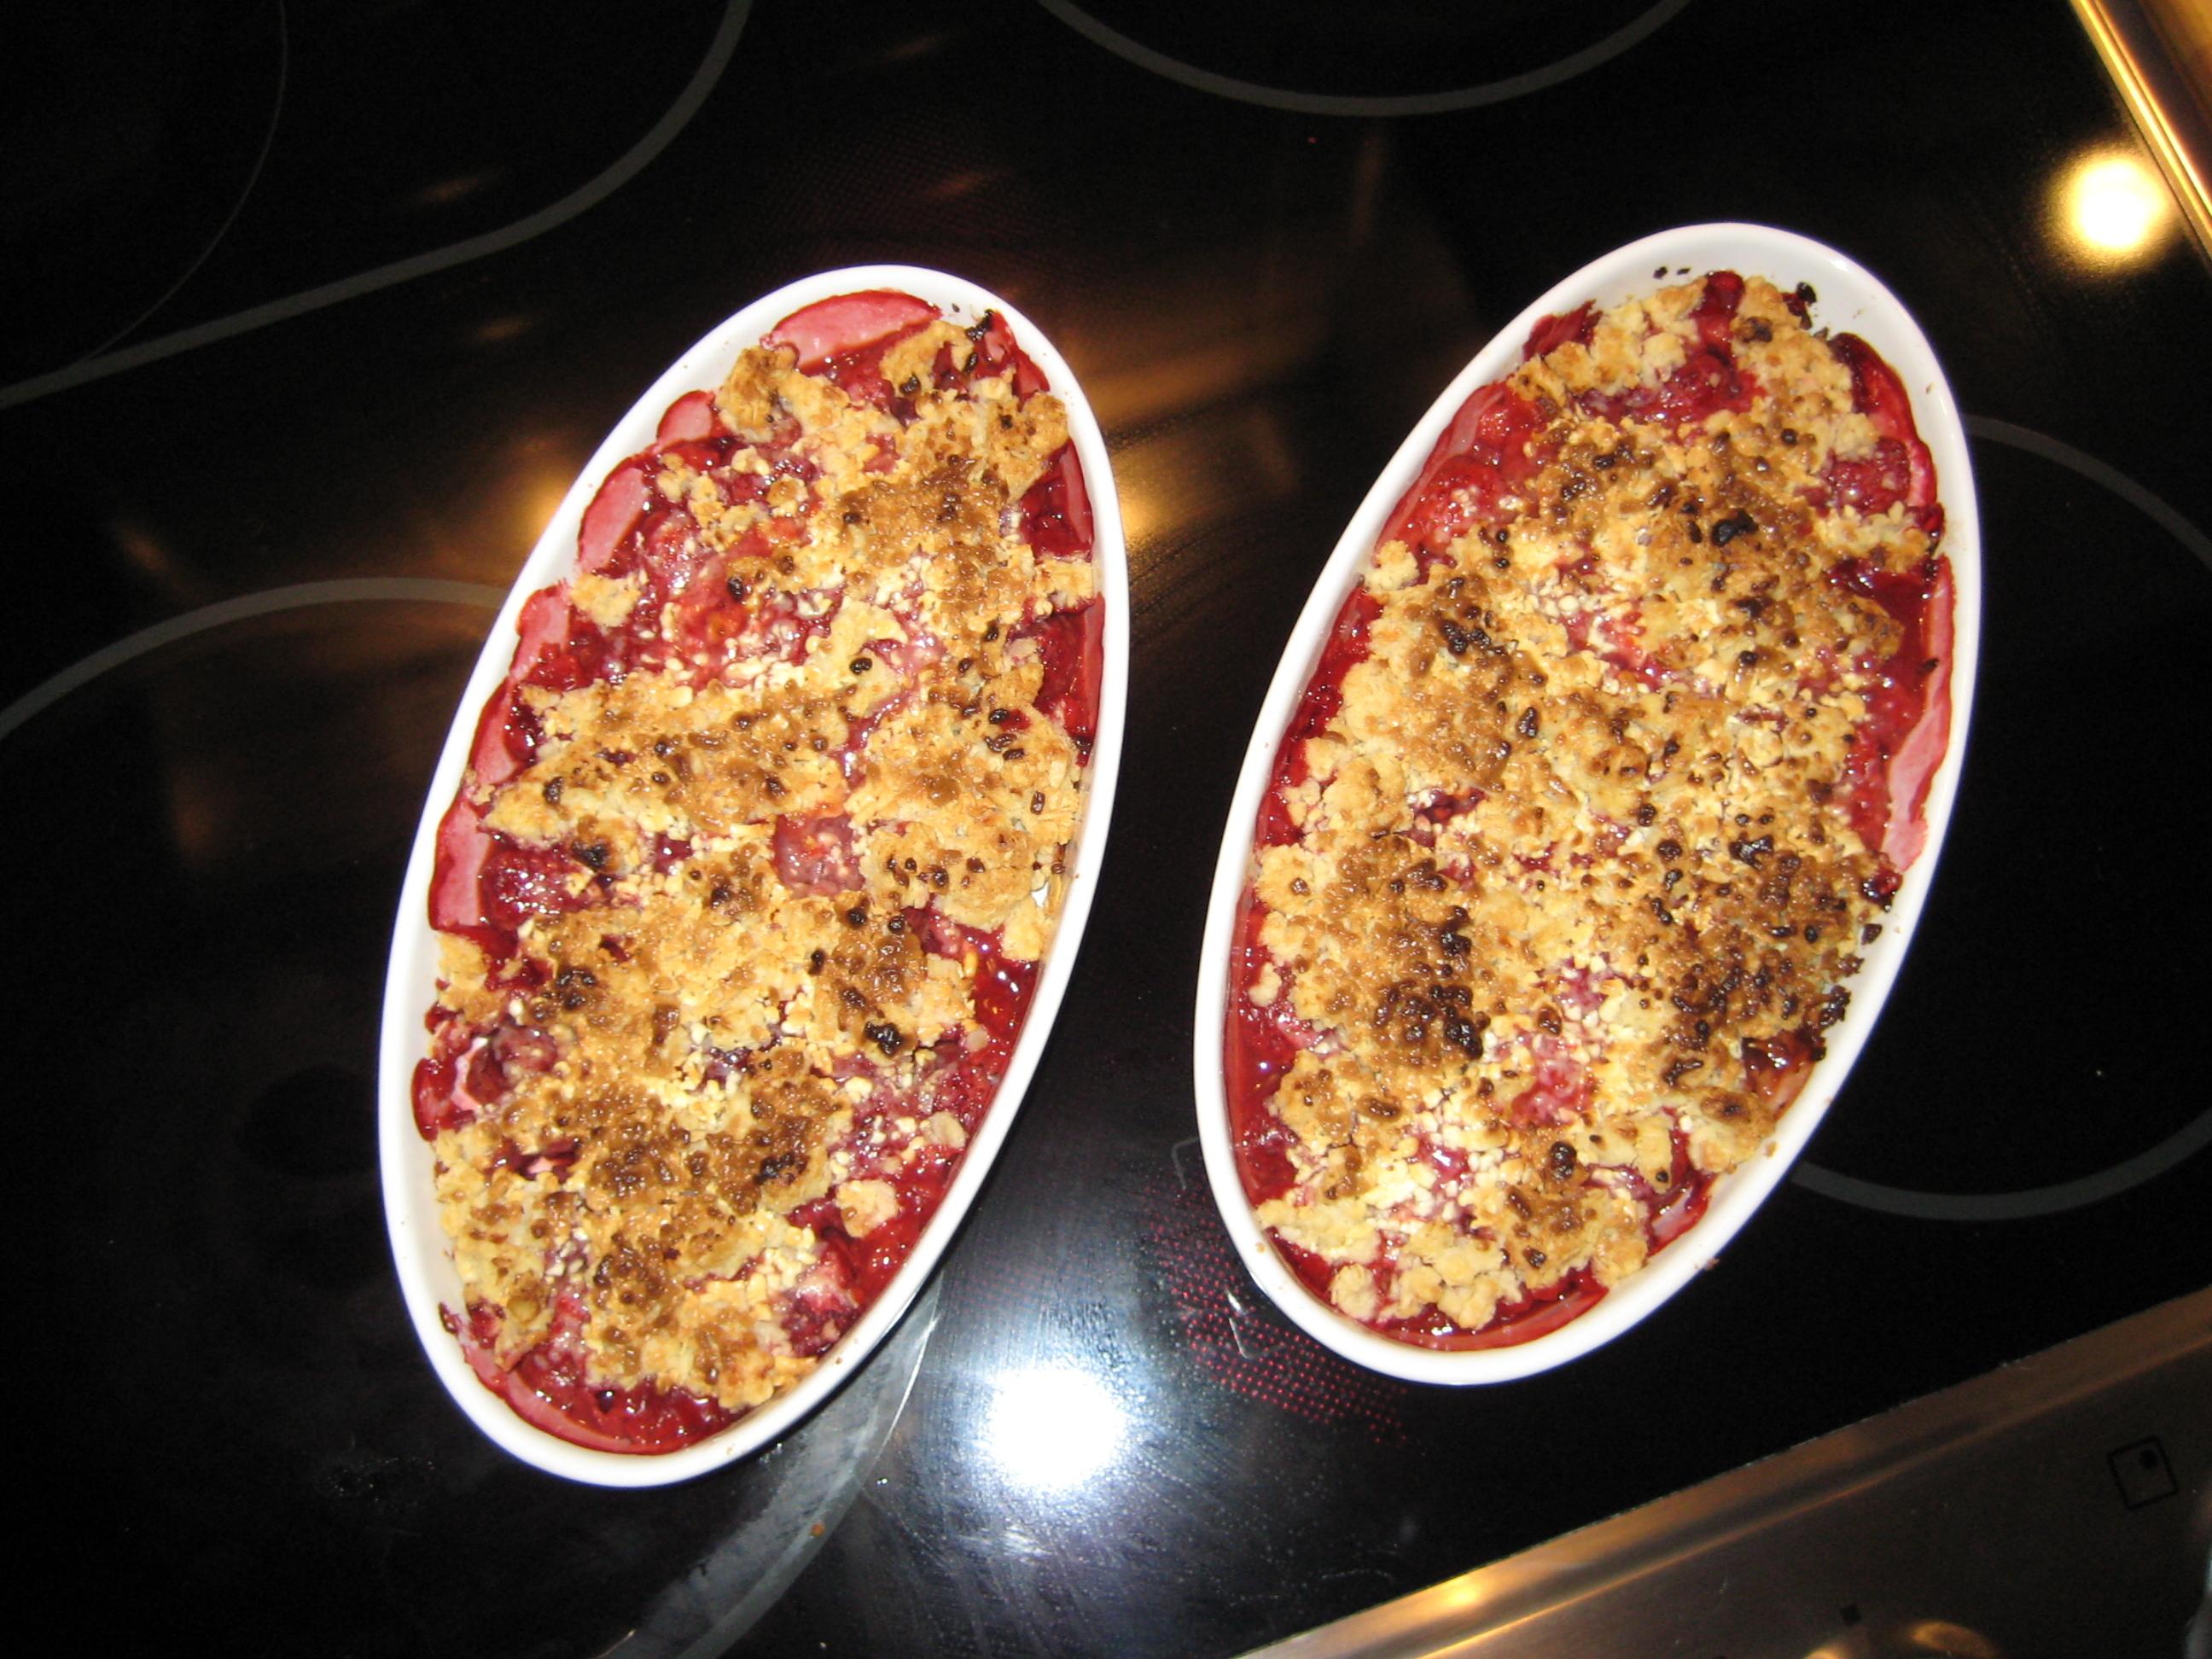 jordgubb och chokladtårta